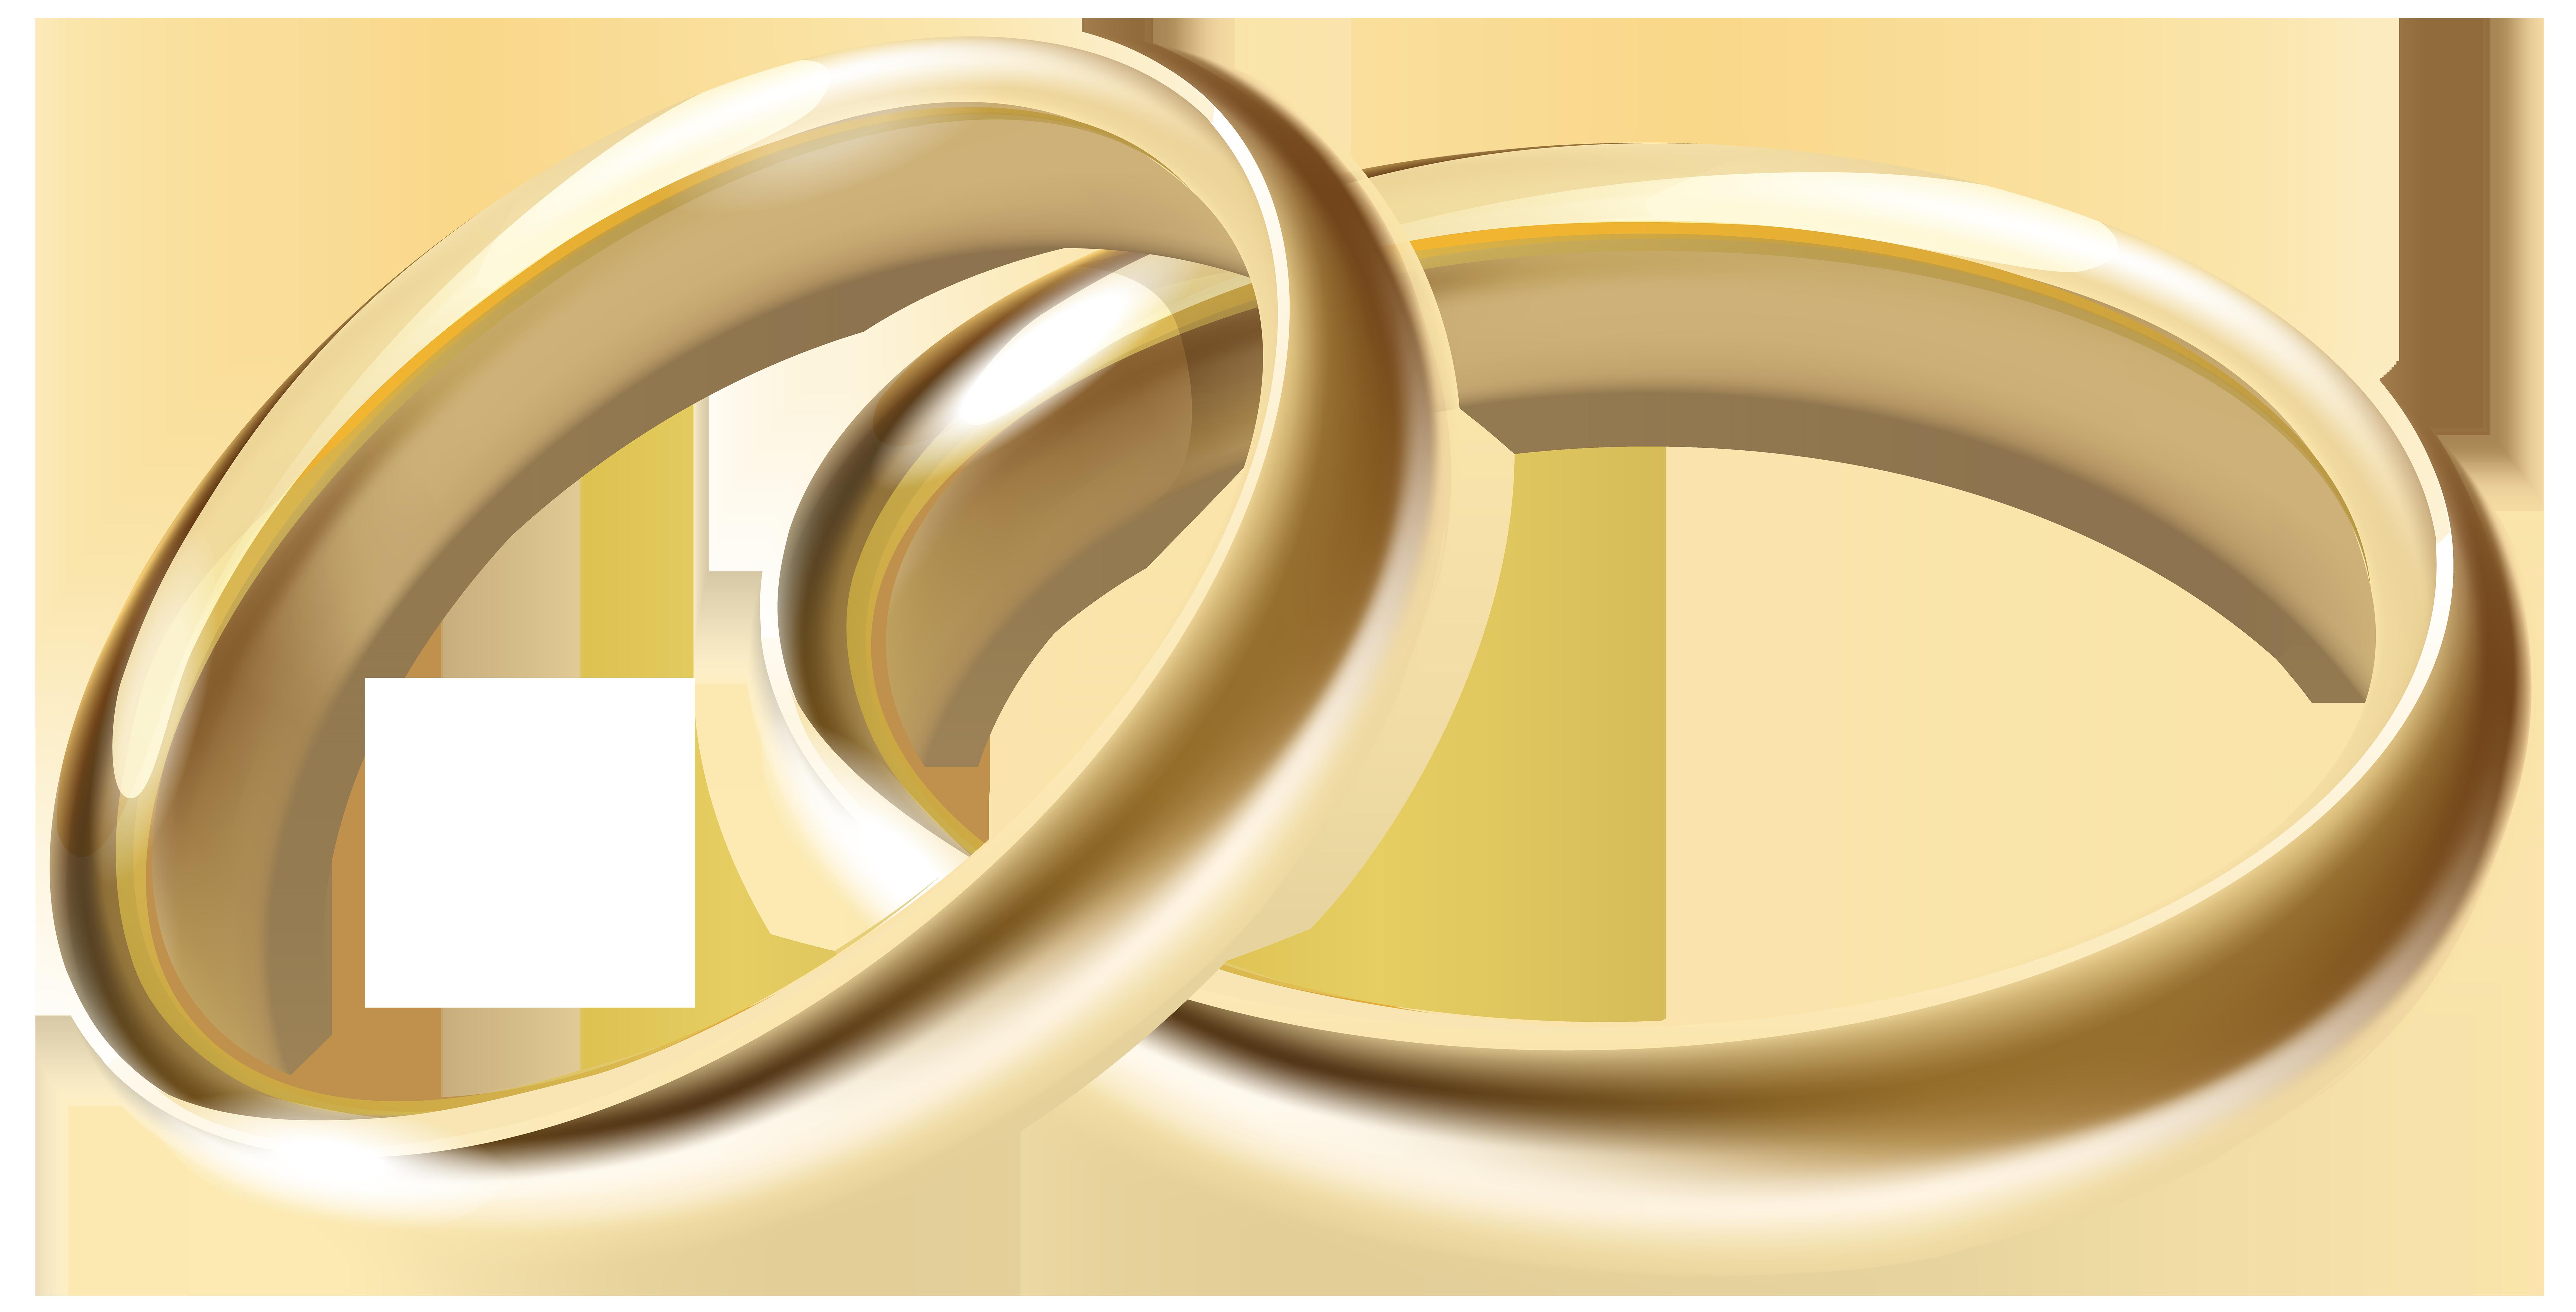 Wedding Rings Transparent PNG Clip Art Image.